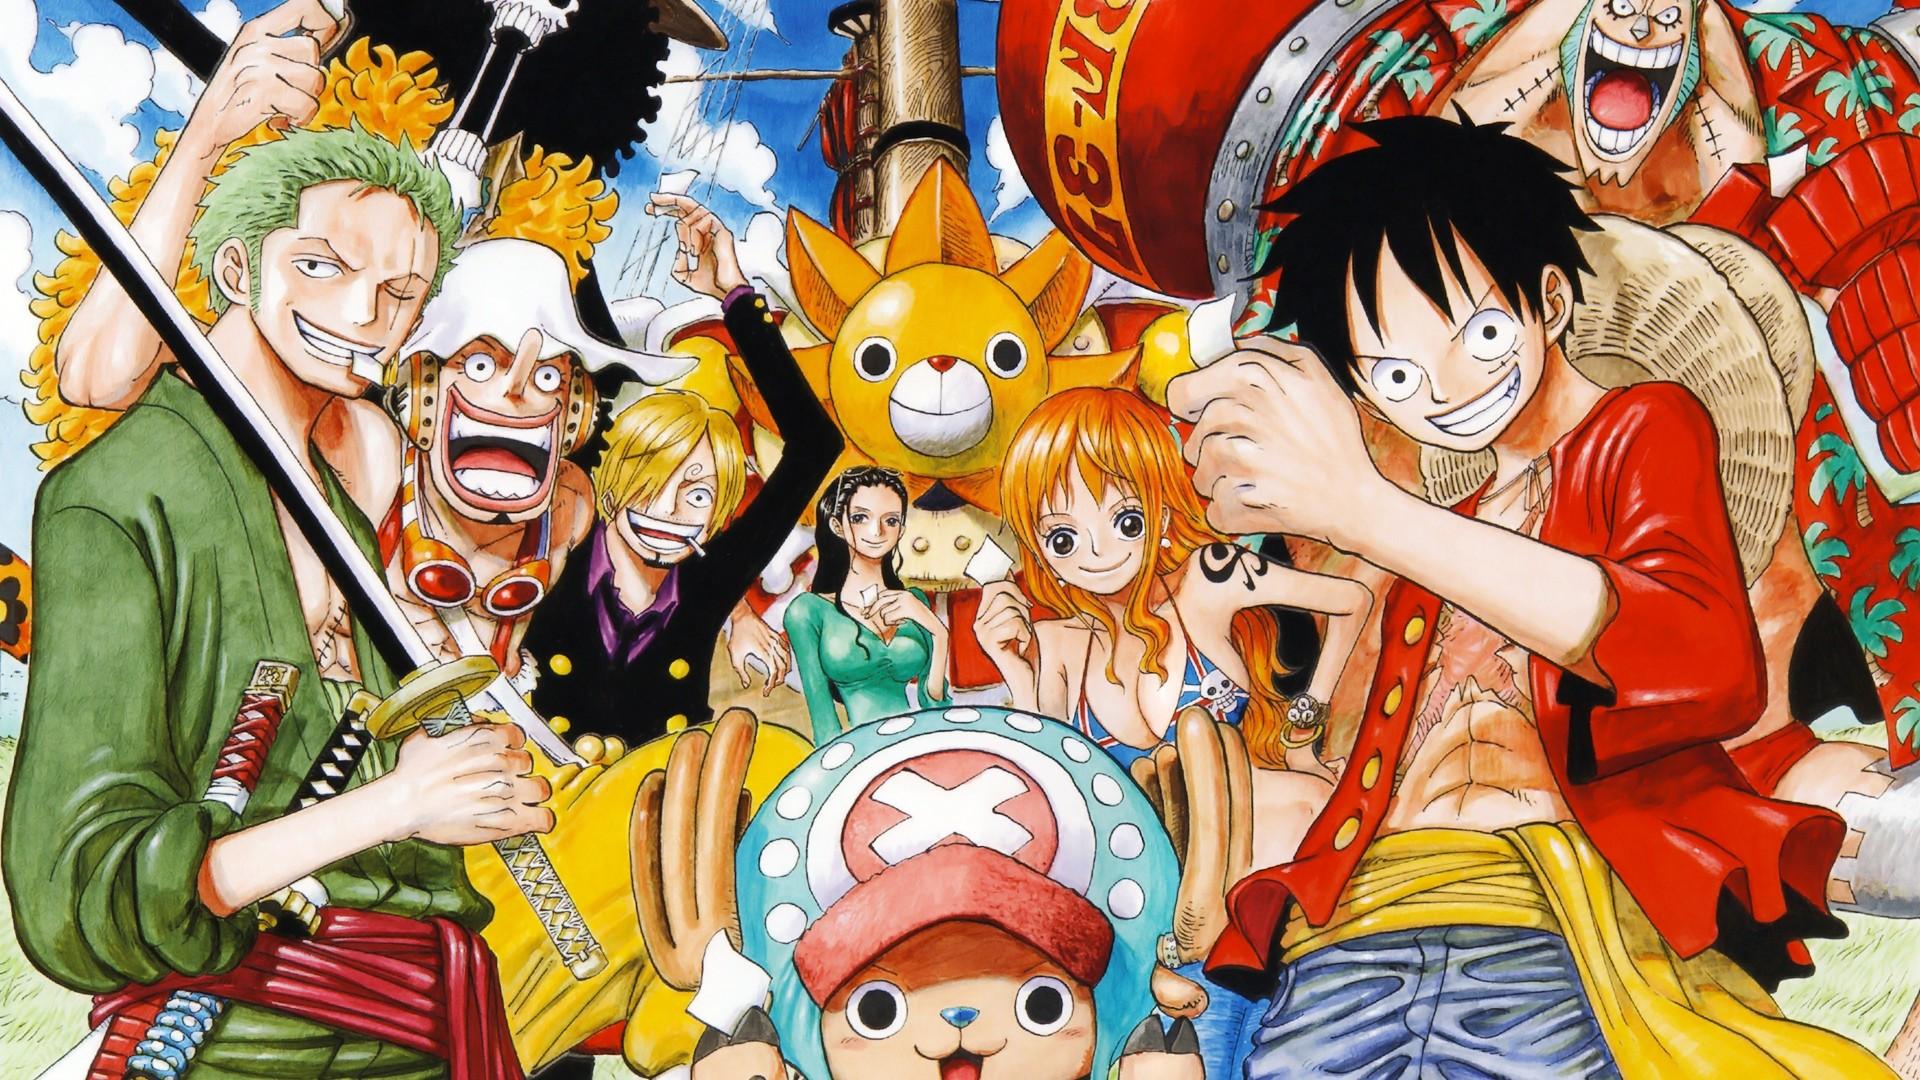 One Piece Wallpaper Hd - One Piece Wallpaper 4k - HD Wallpaper